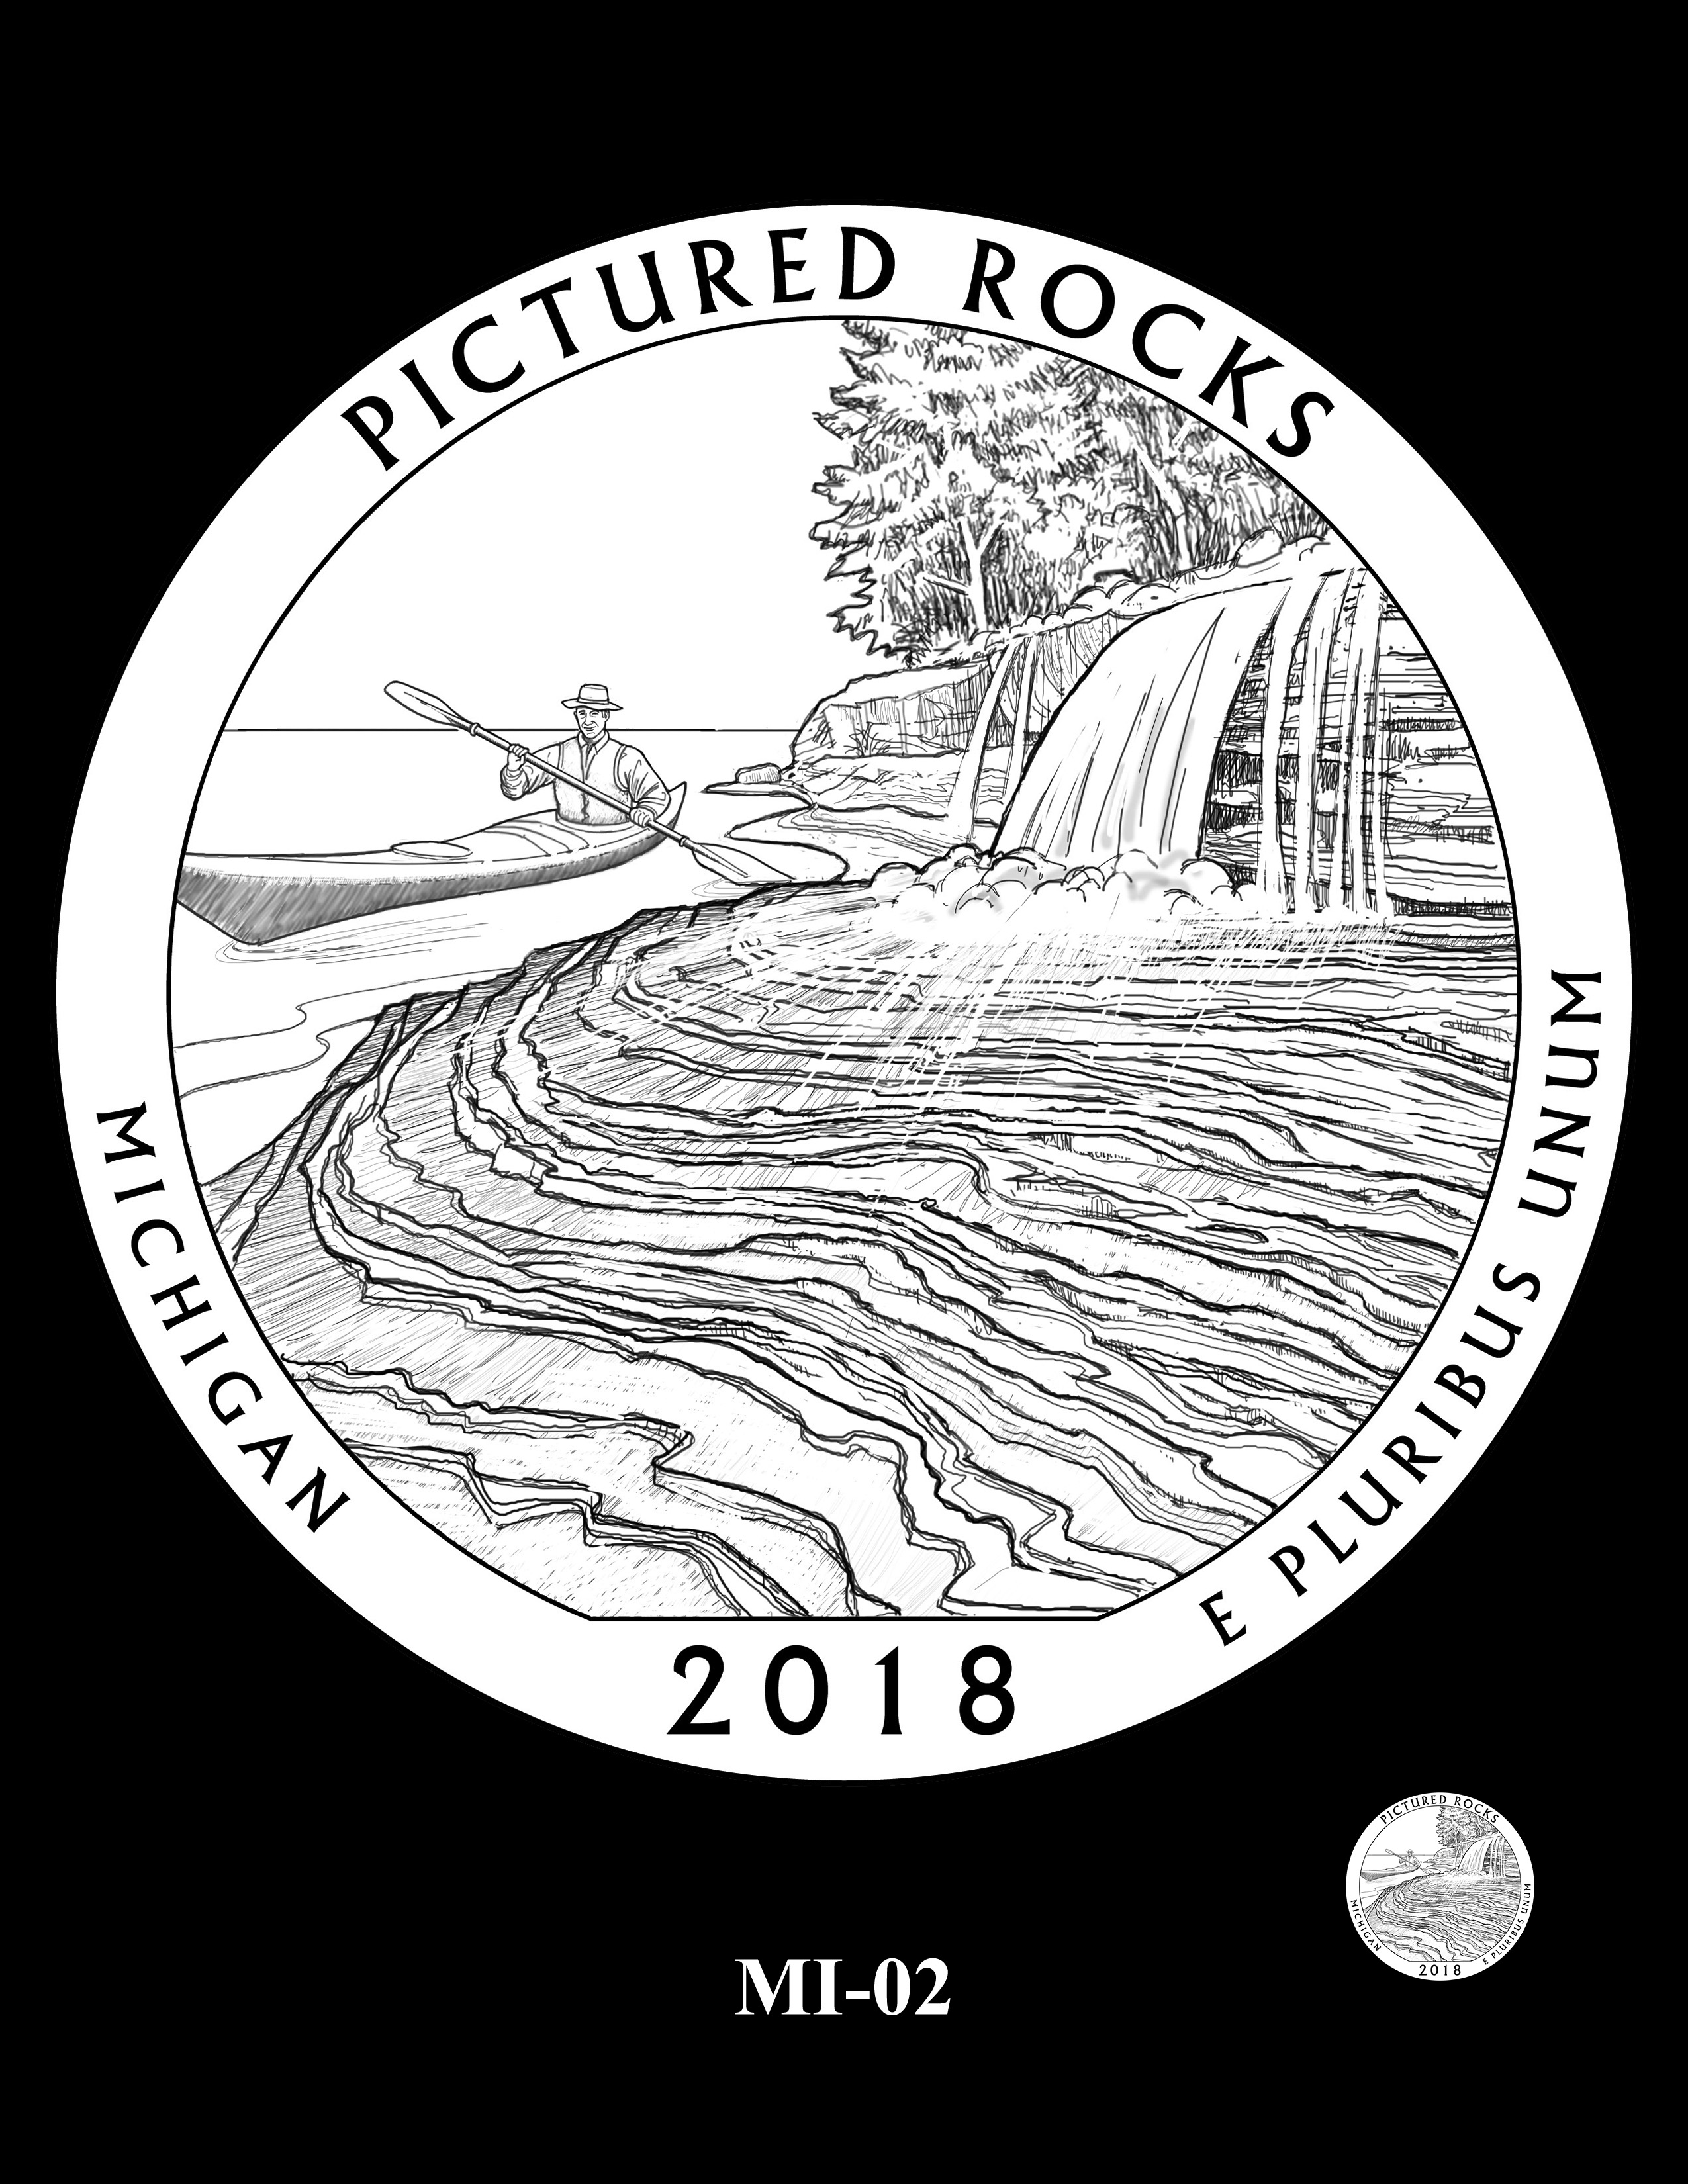 MI-02 -- 2018 America the Beautiful® Quarters Program